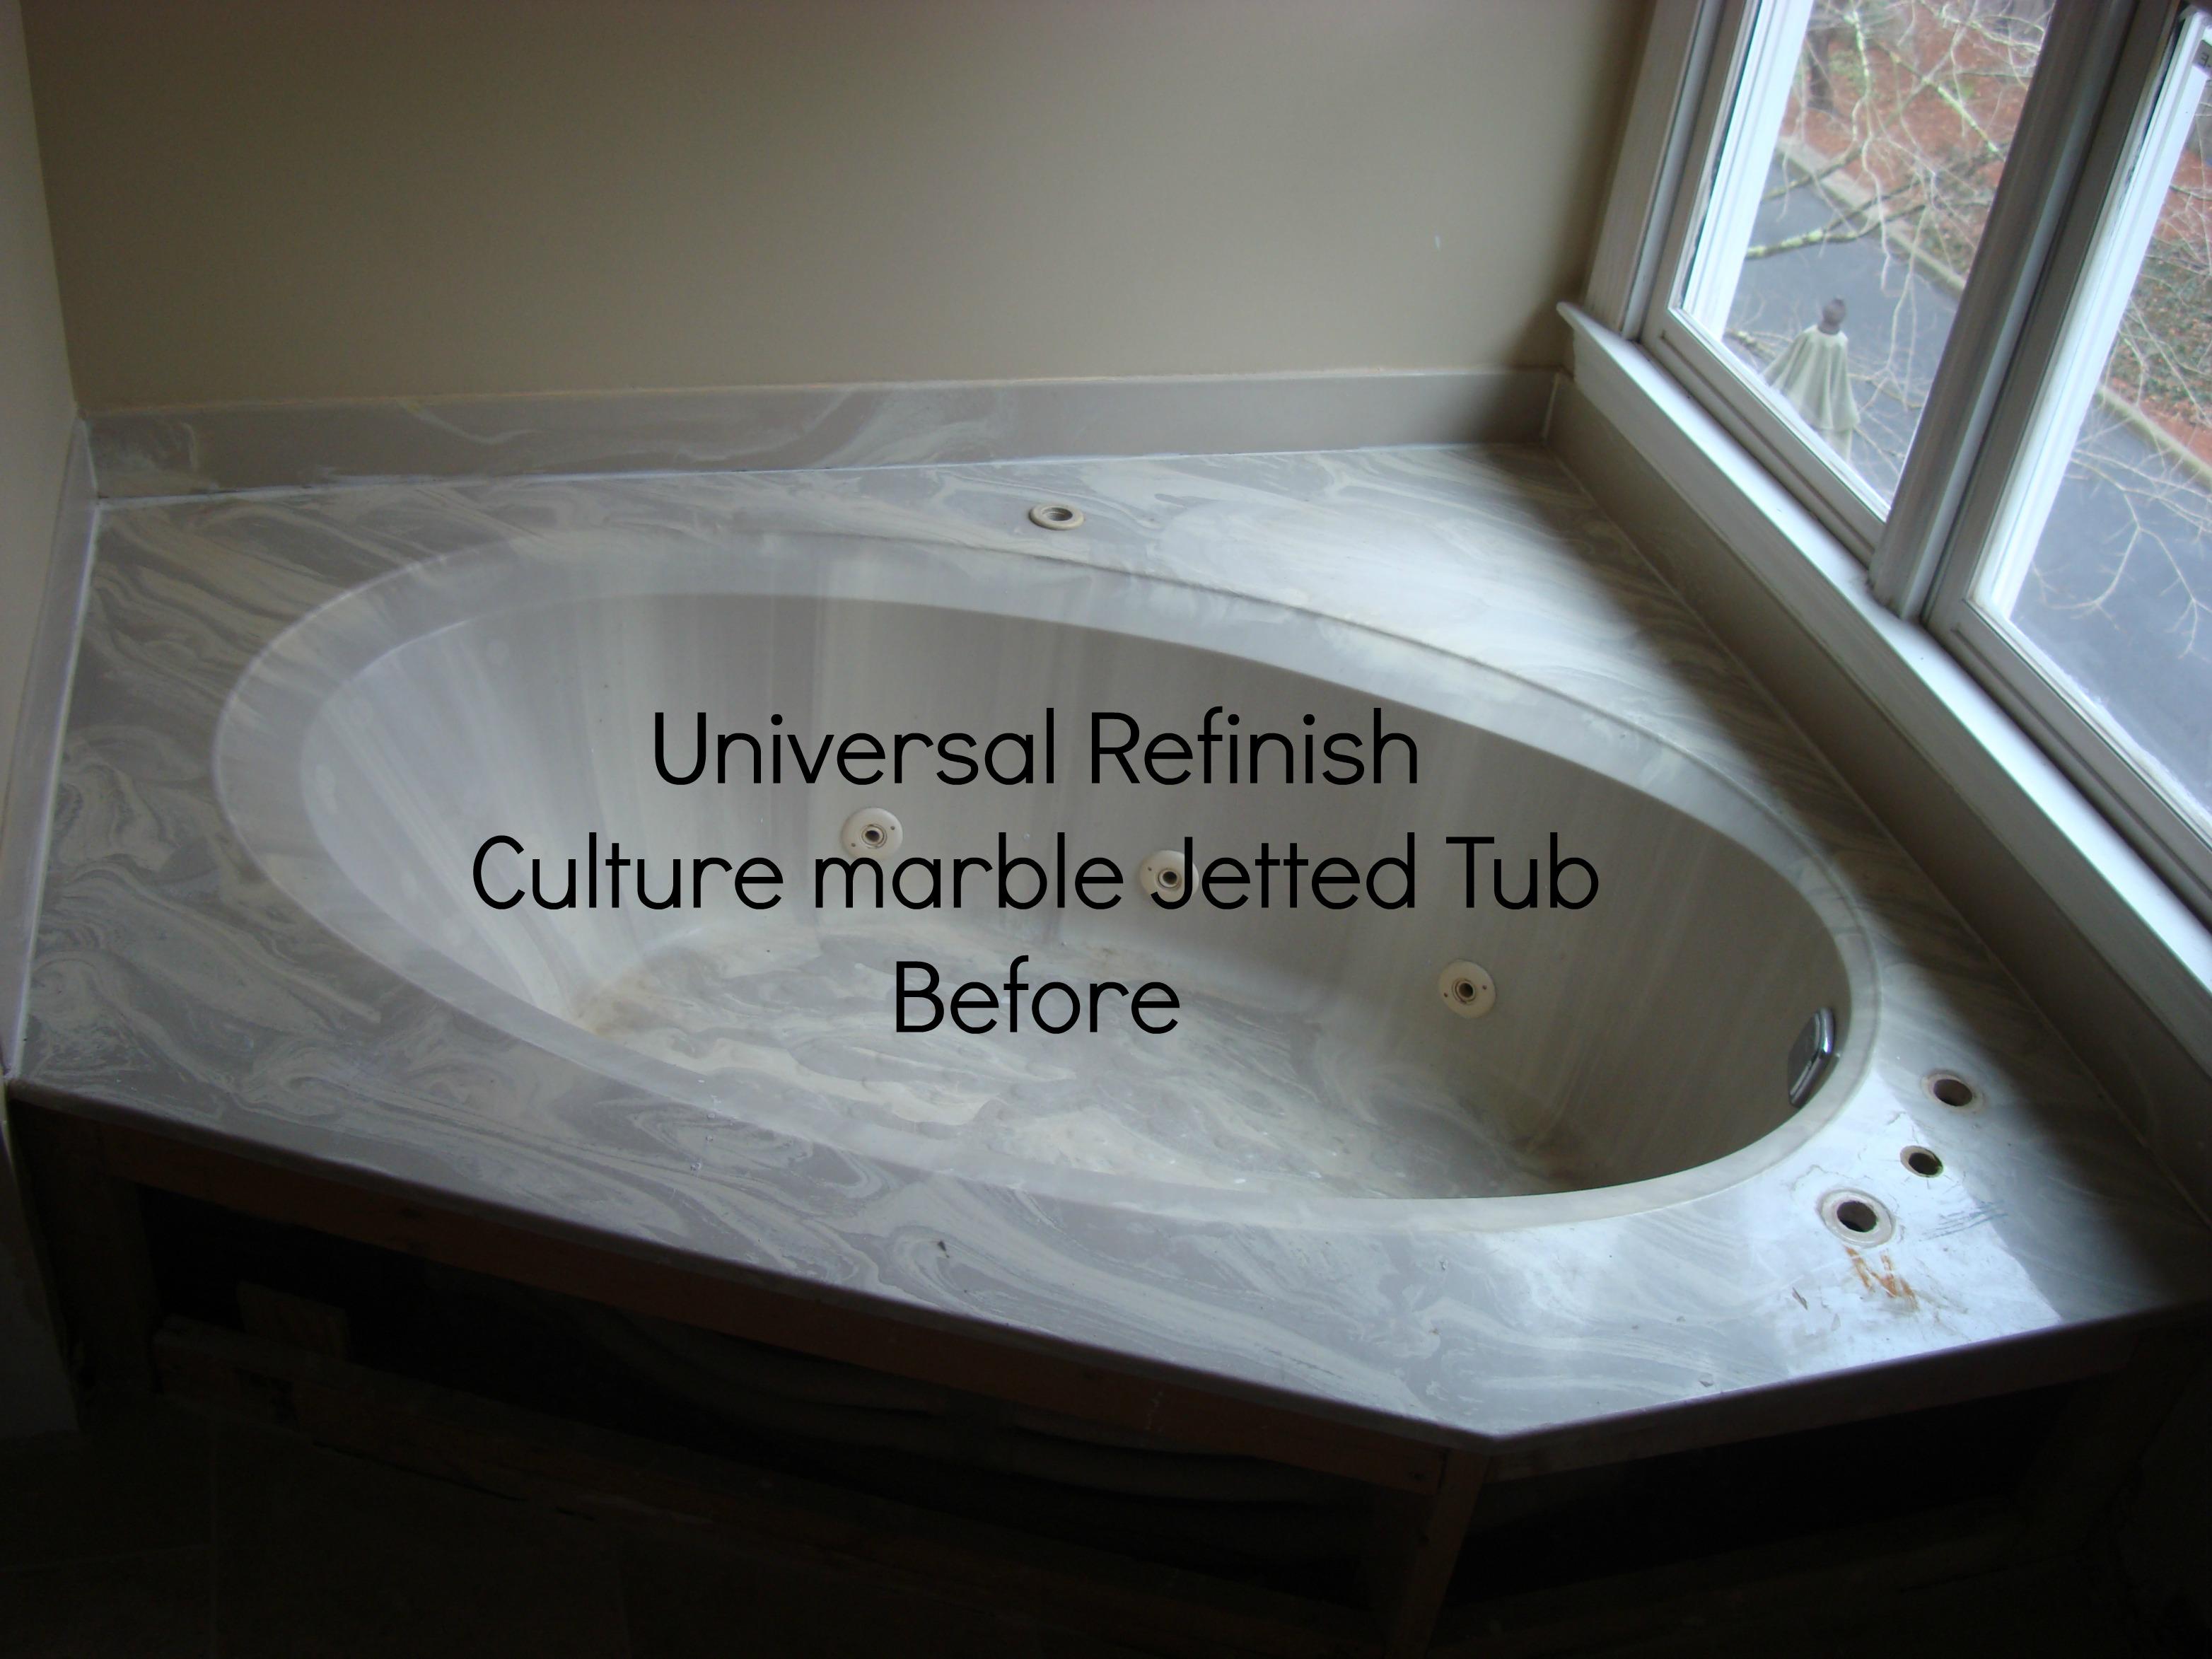 Attractive Universal Refinish